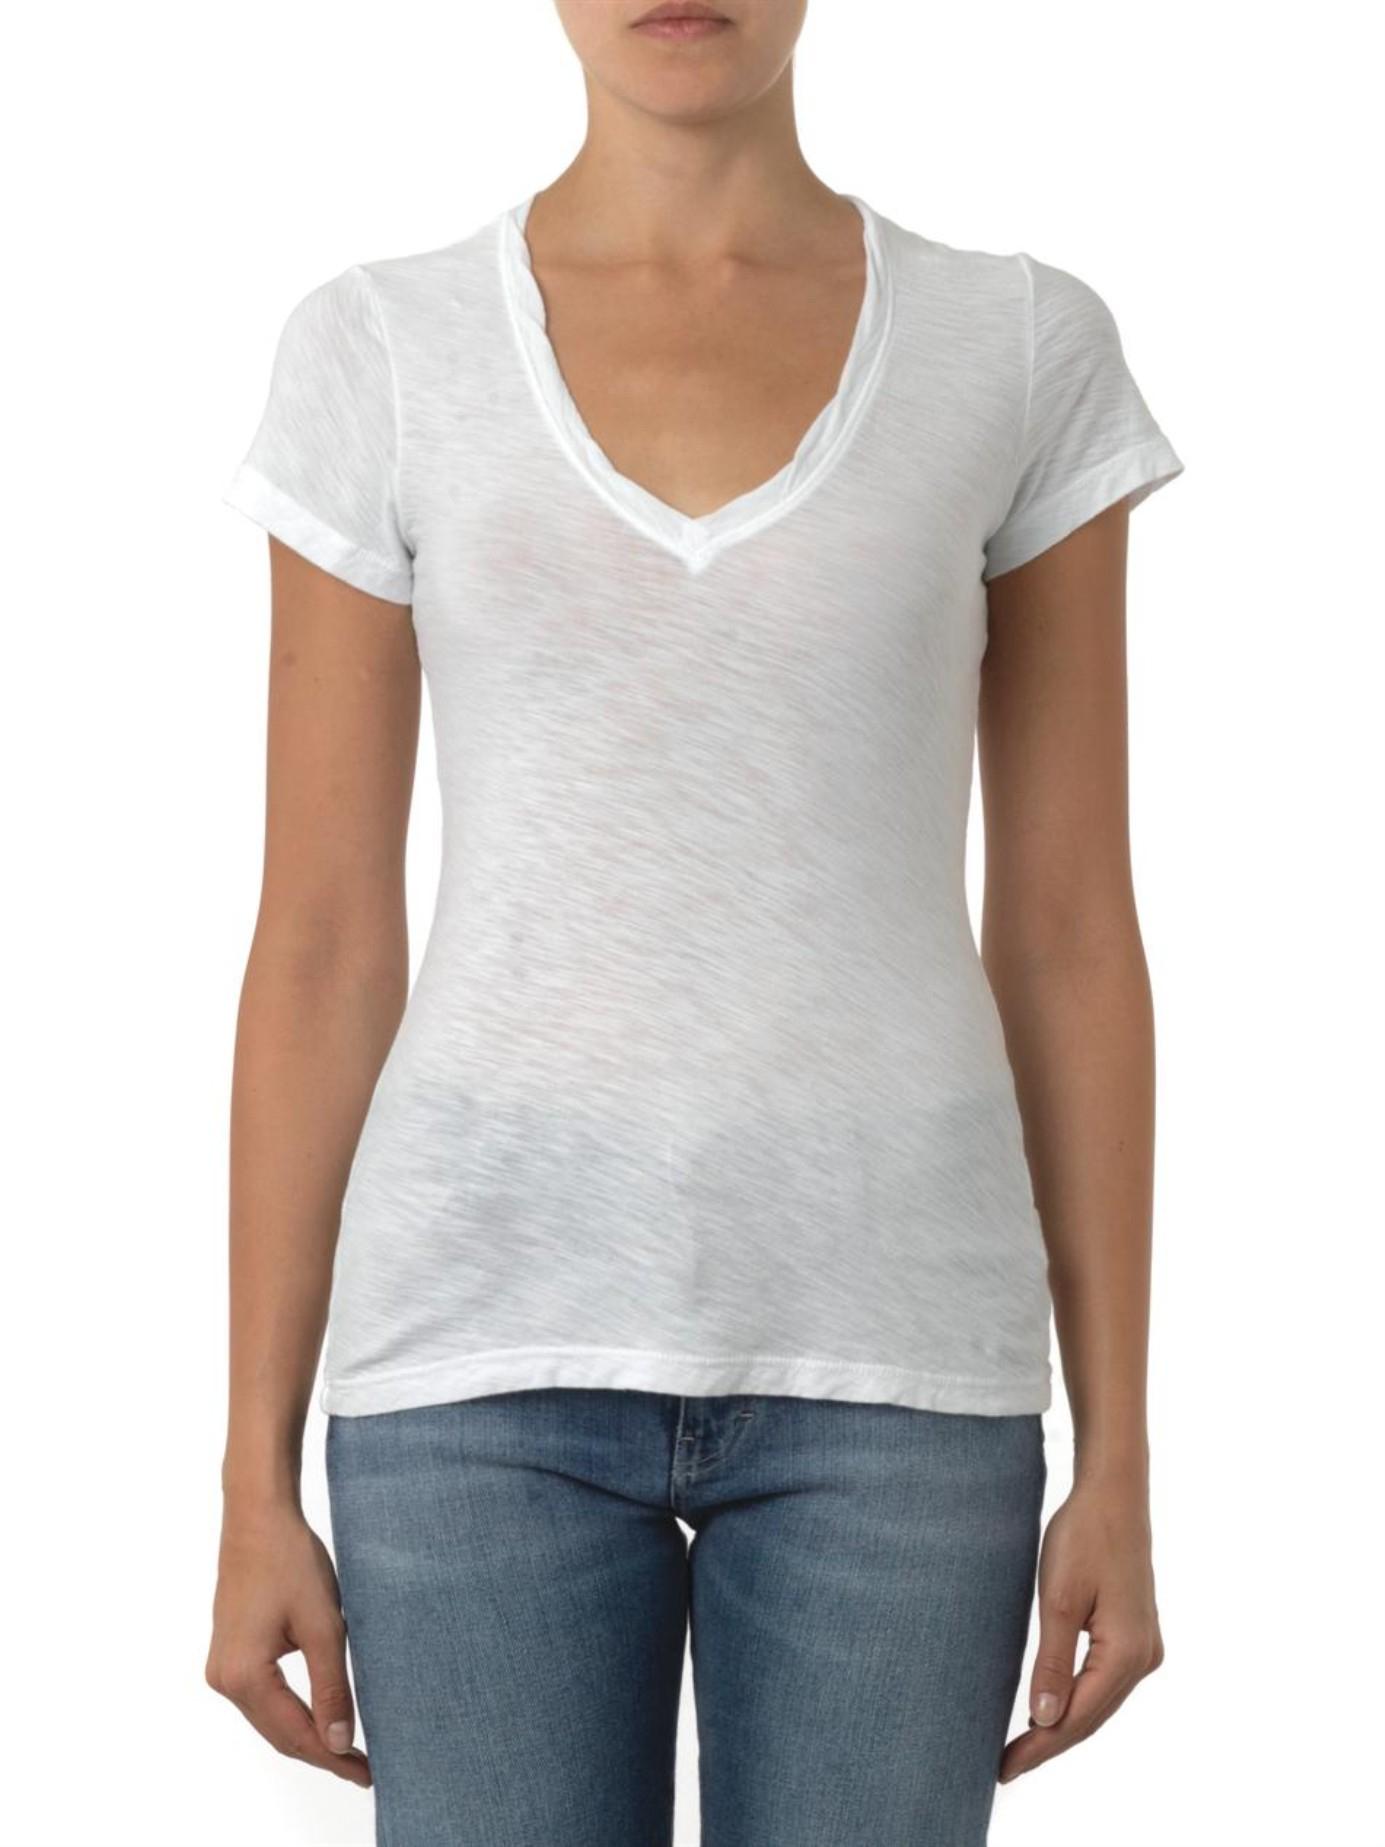 7c9c9034c42 James Perse V-neck Slub-cotton T-shirt in White - Lyst